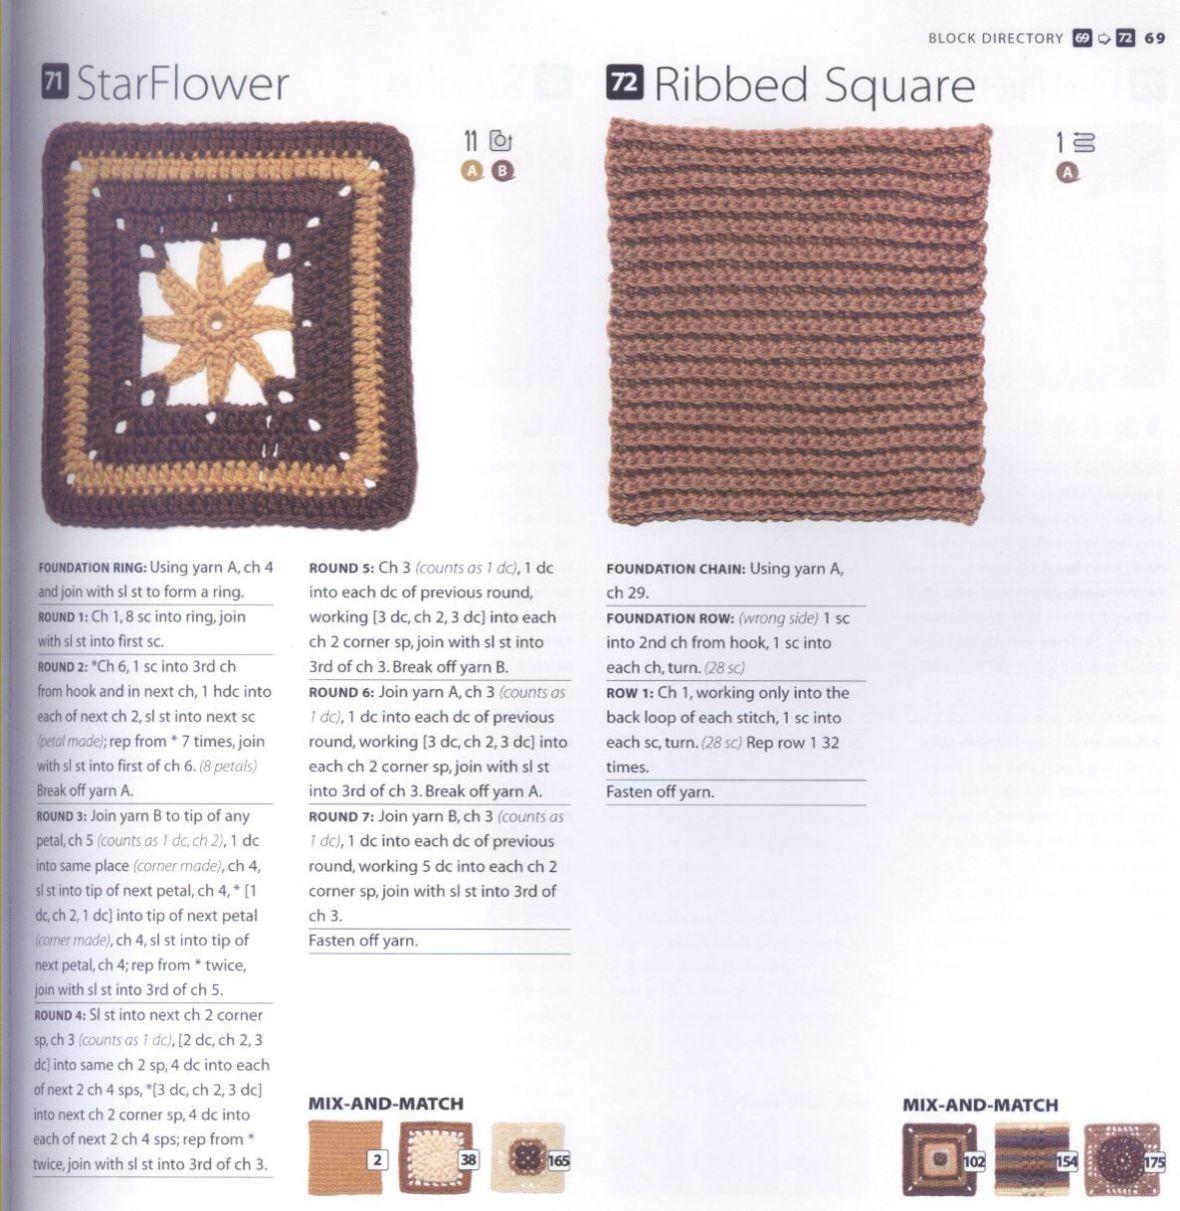 200 Crocheted Blocks for blankets, throws & Afghans 069